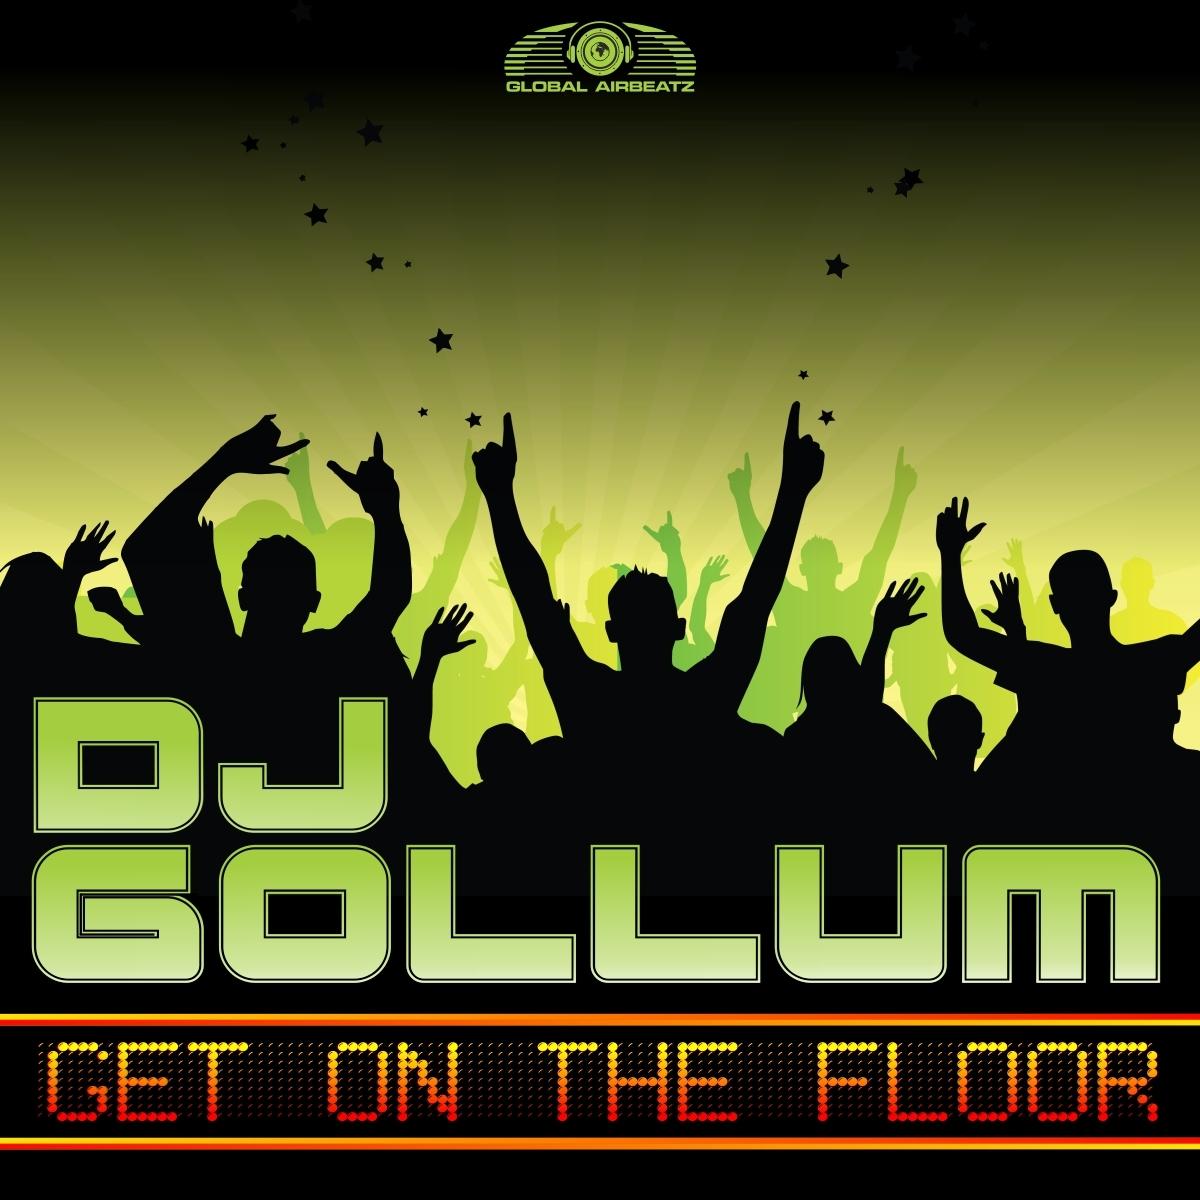 Gaz014 dj gollum get on the floor global airbeatz for 1234 get on the dance floor dj mix